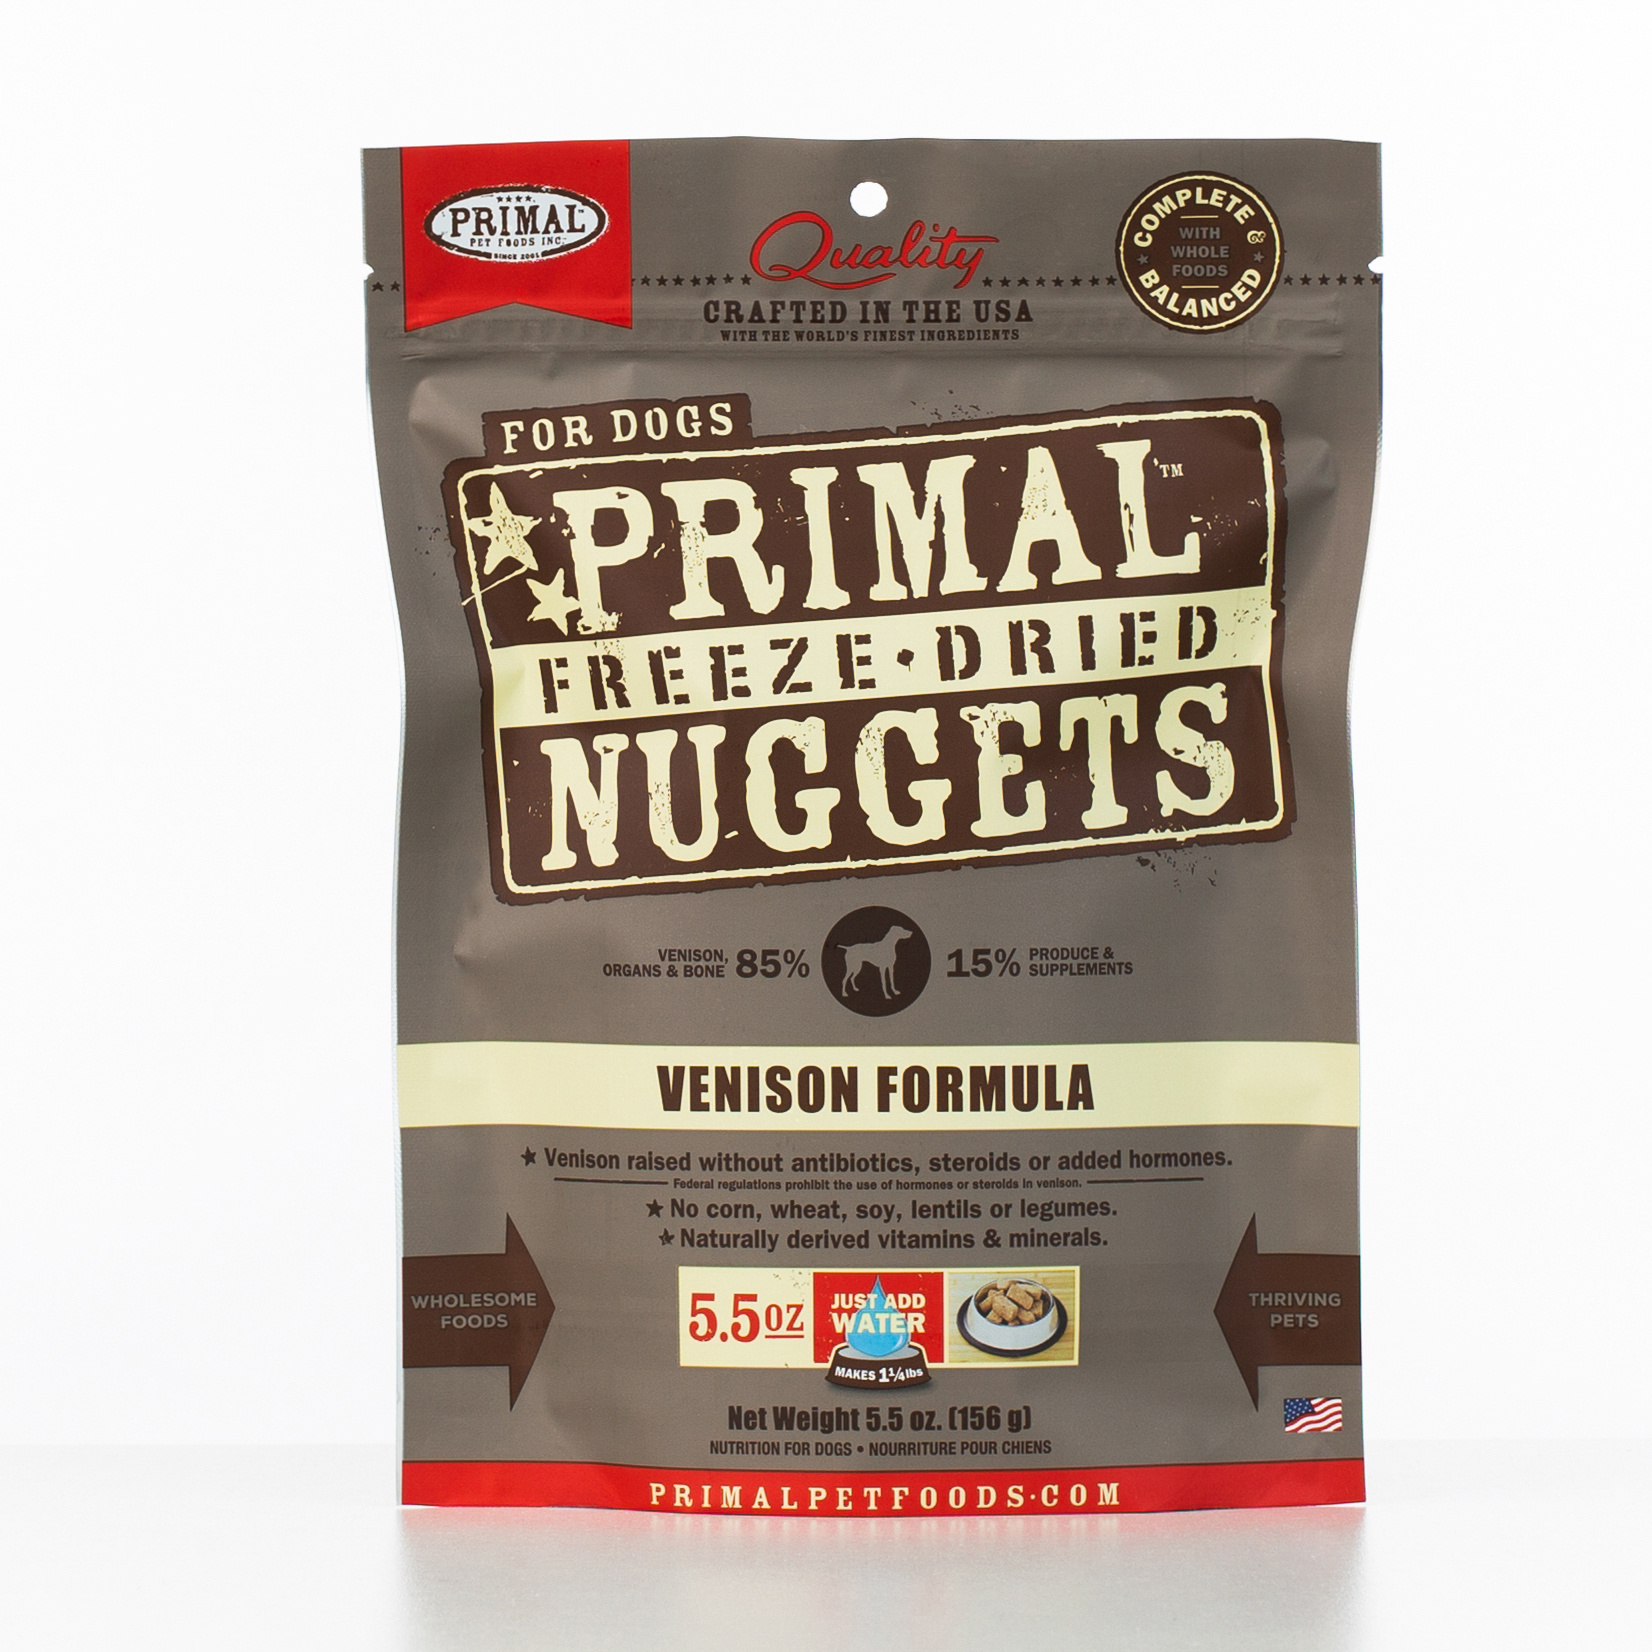 Primal Raw Freeze-Dried Nuggets Venison Formula Dog Food, 5.5-oz